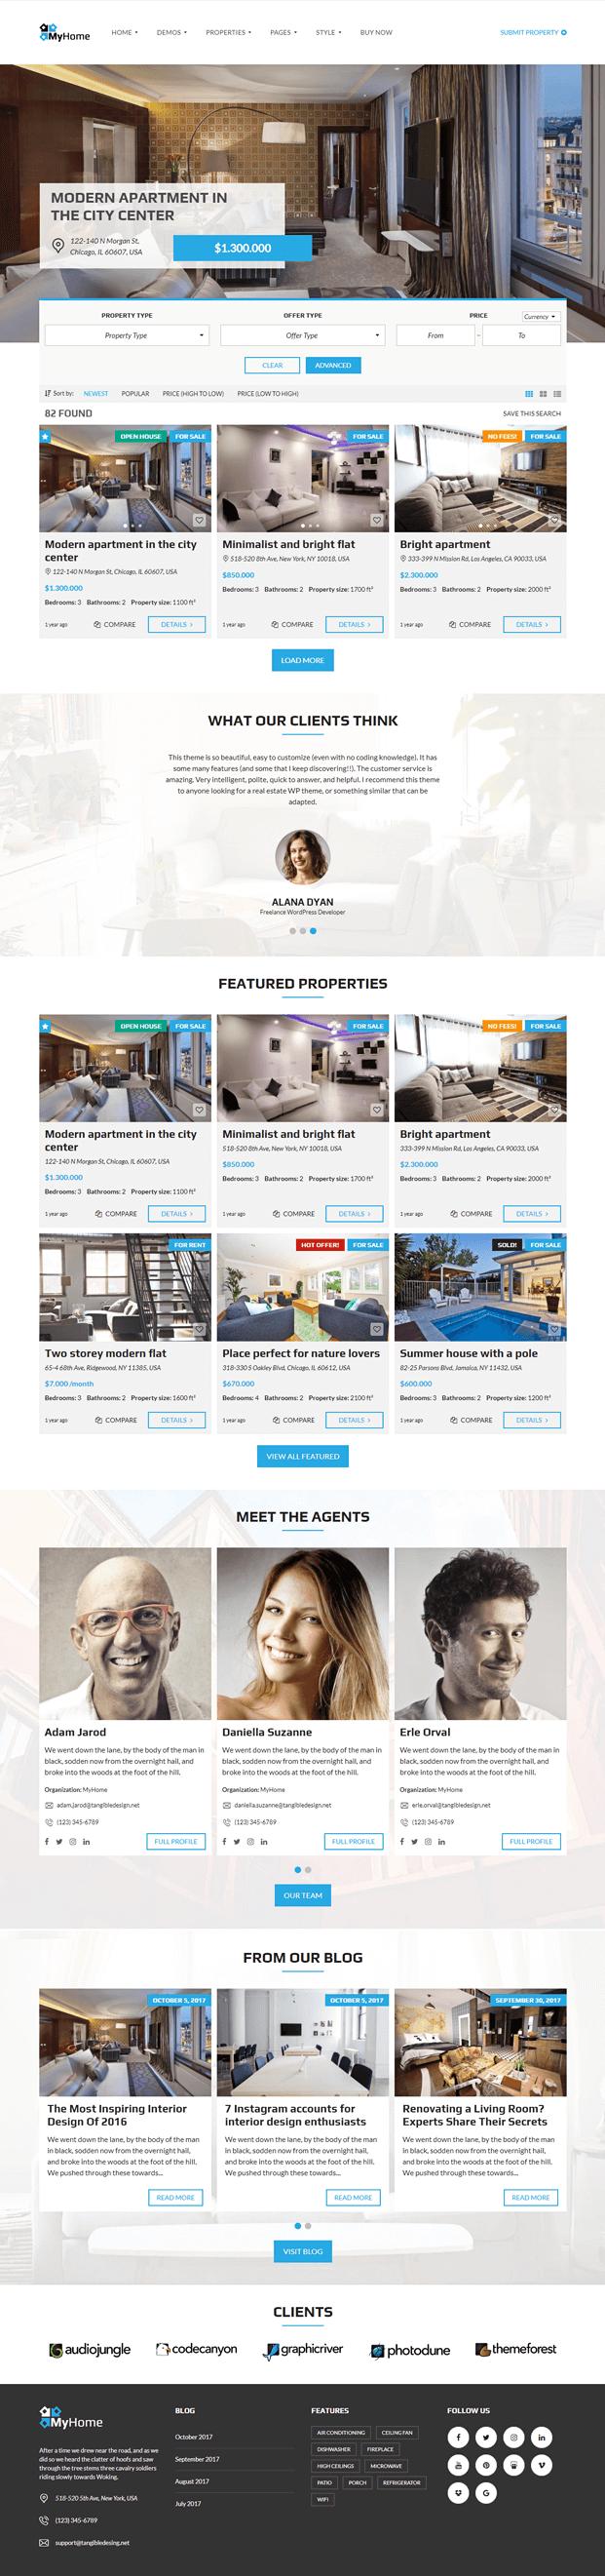 Home - Real Estate Agency WordPress Theme